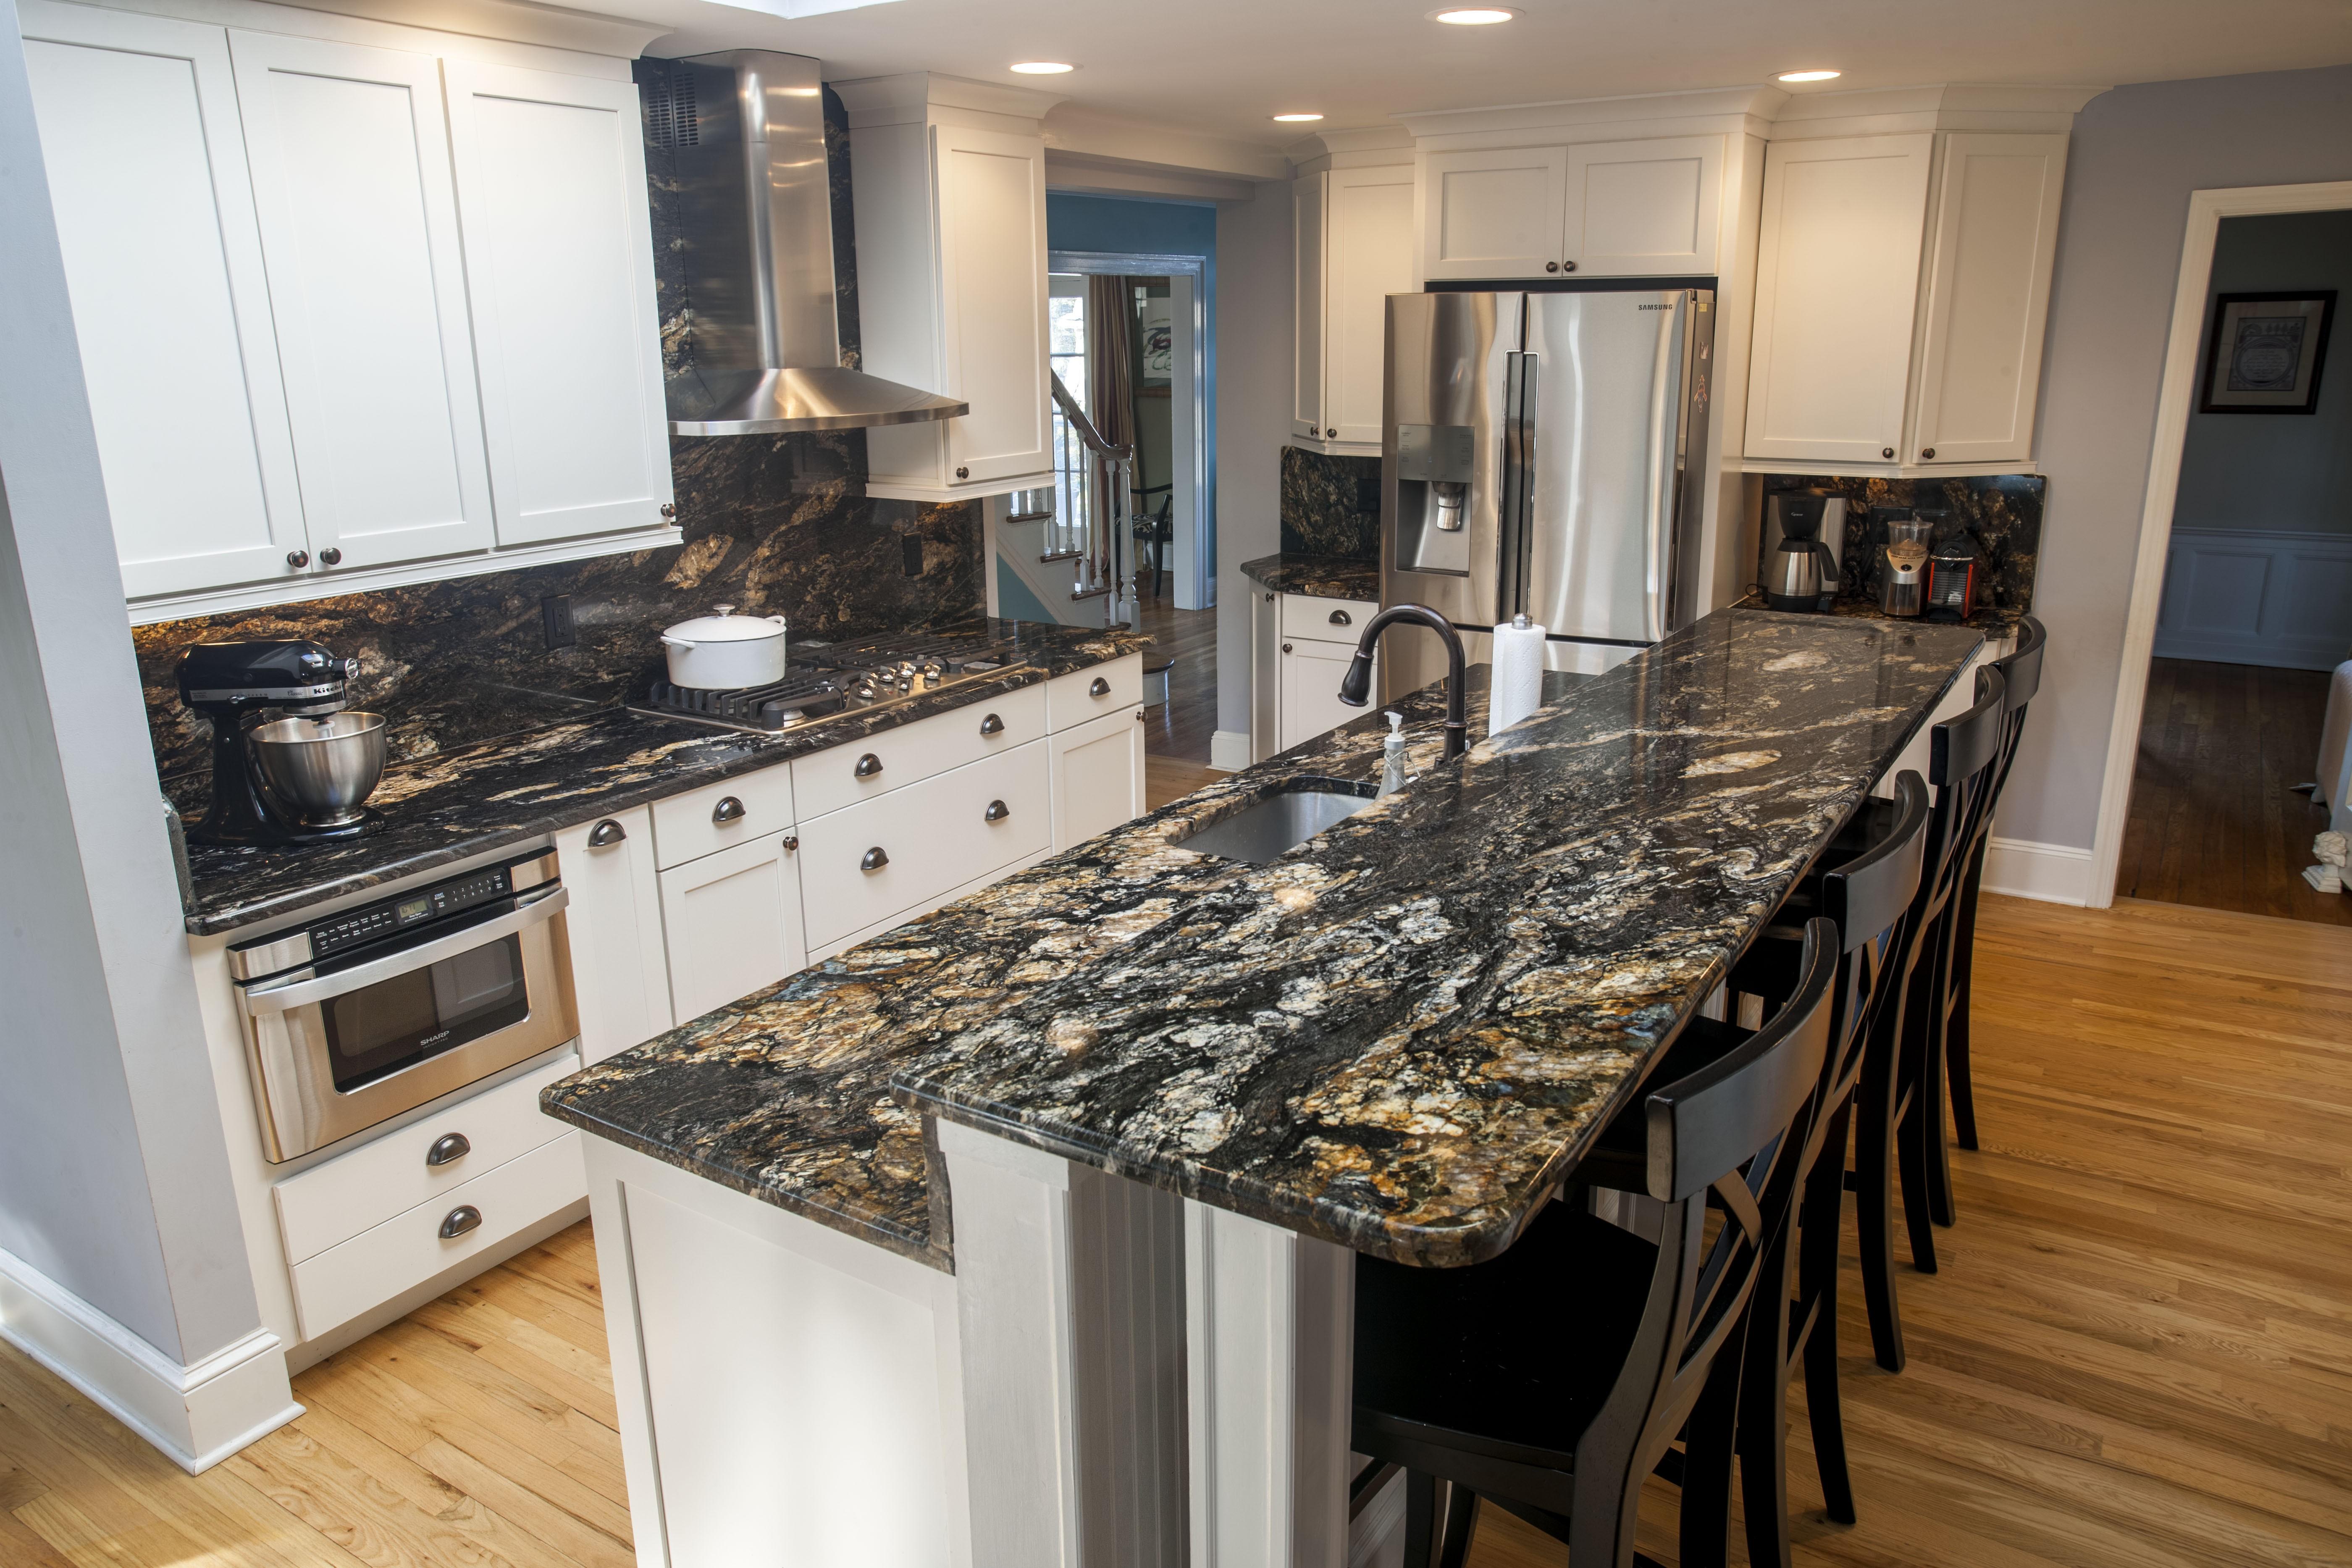 Beige with black and white kitchen granite countertops for Black and beige kitchen